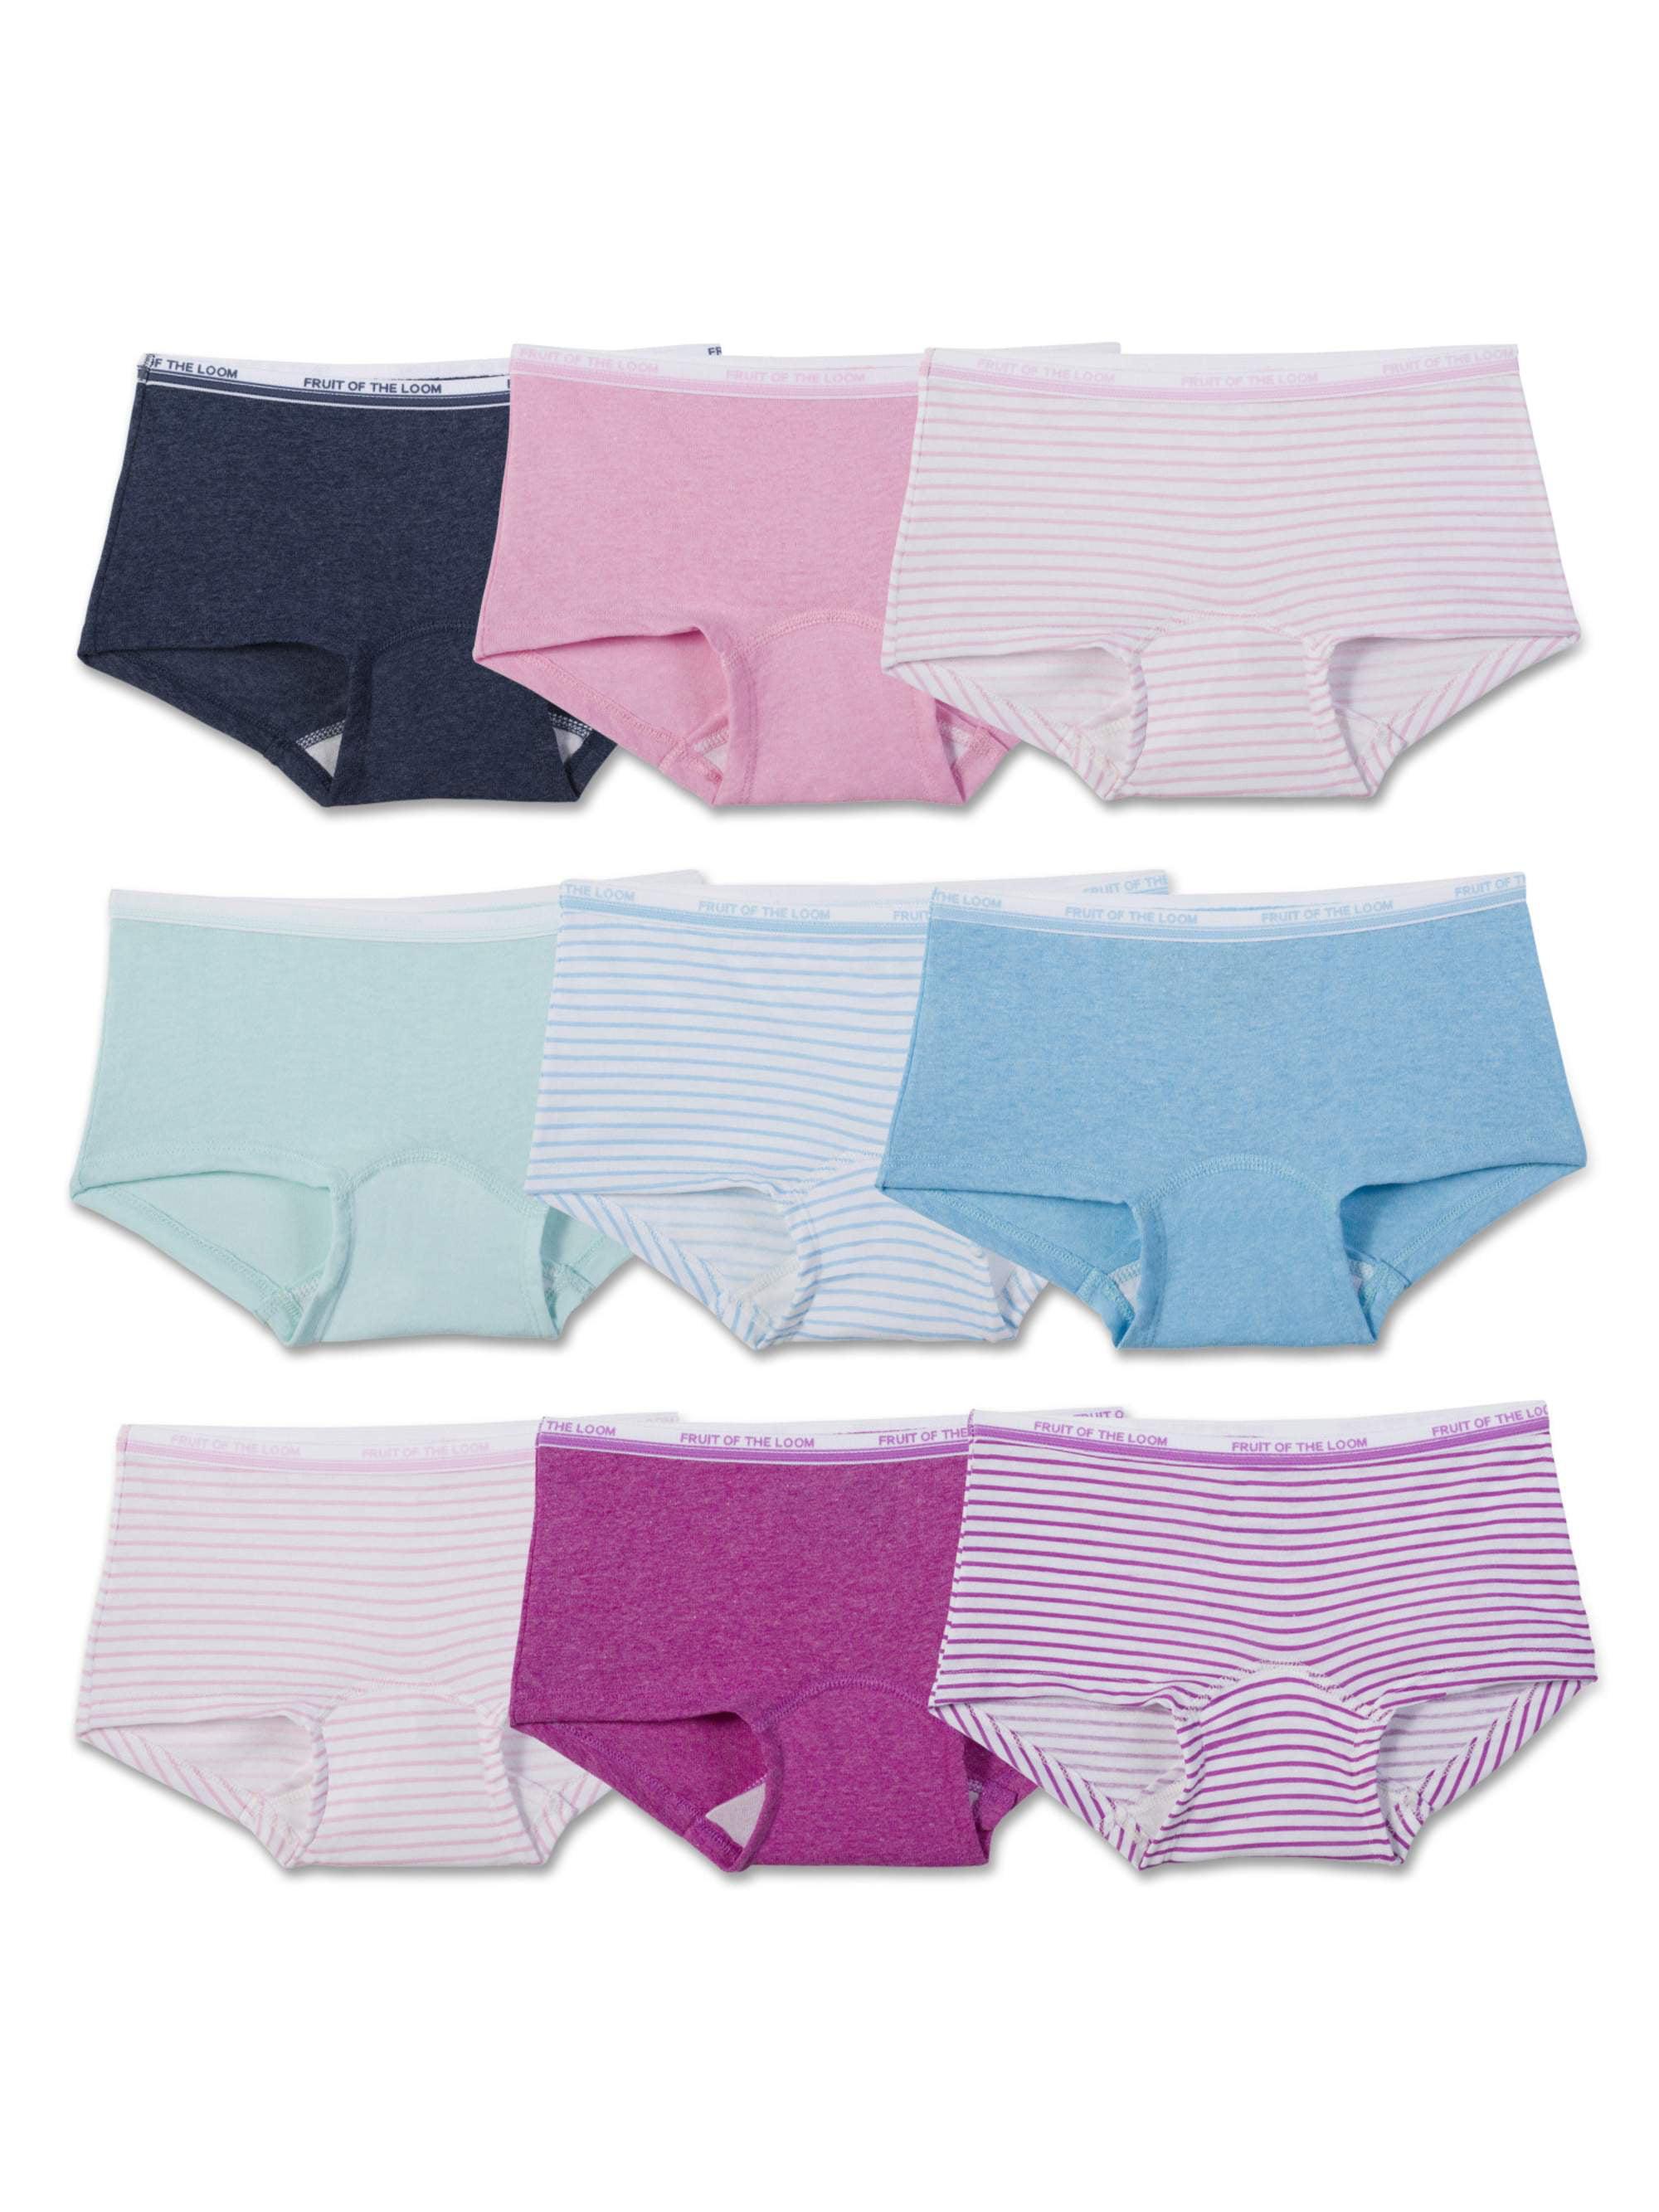 Assorted Heather Boy Shorts, 9 Pack (Little Girls & Big Girls)